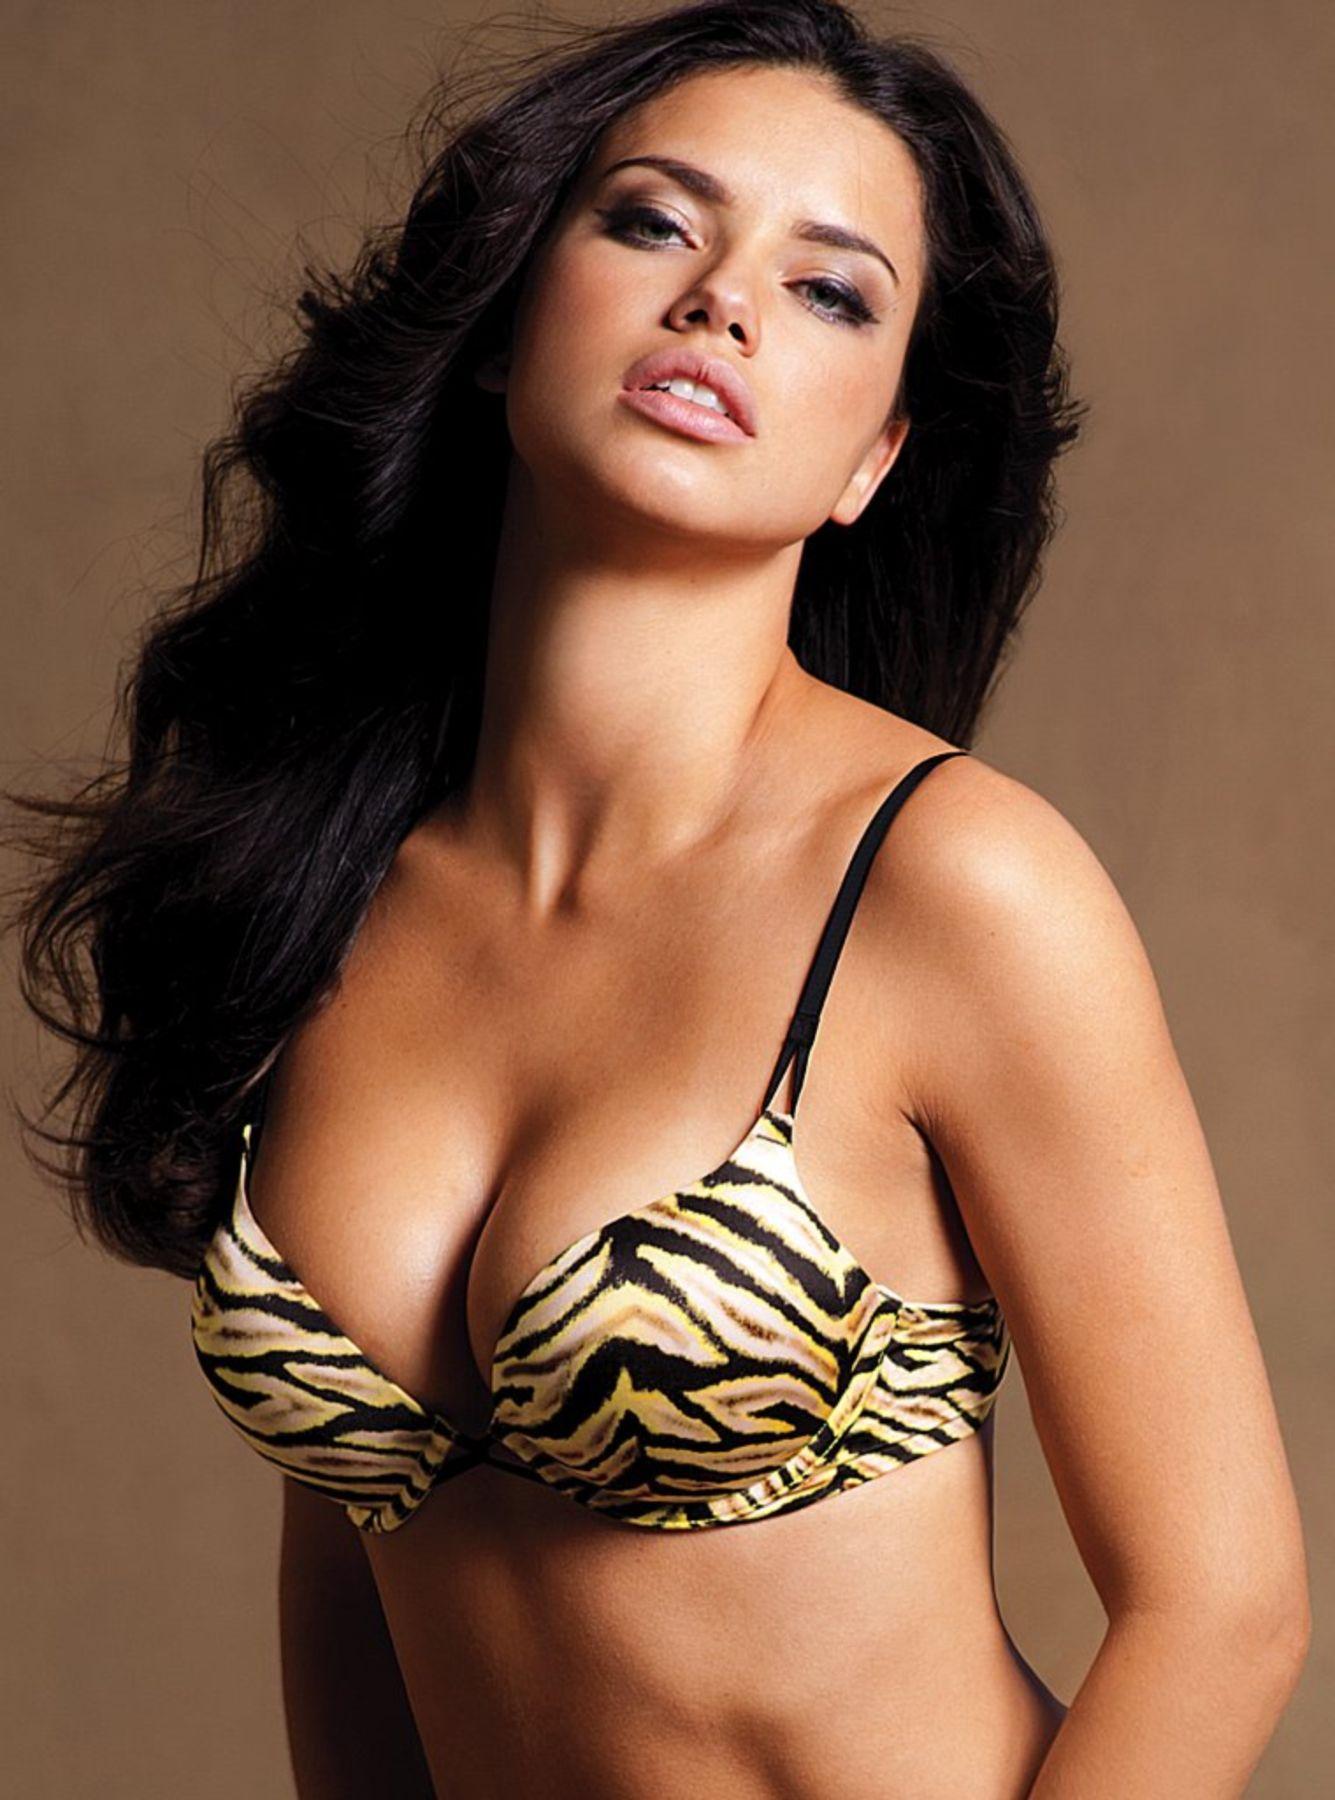 Best 25 Model Home Decorating Ideas On Pinterest: Adriana Lima Victoria's Secret 2011 Koleksiyonu